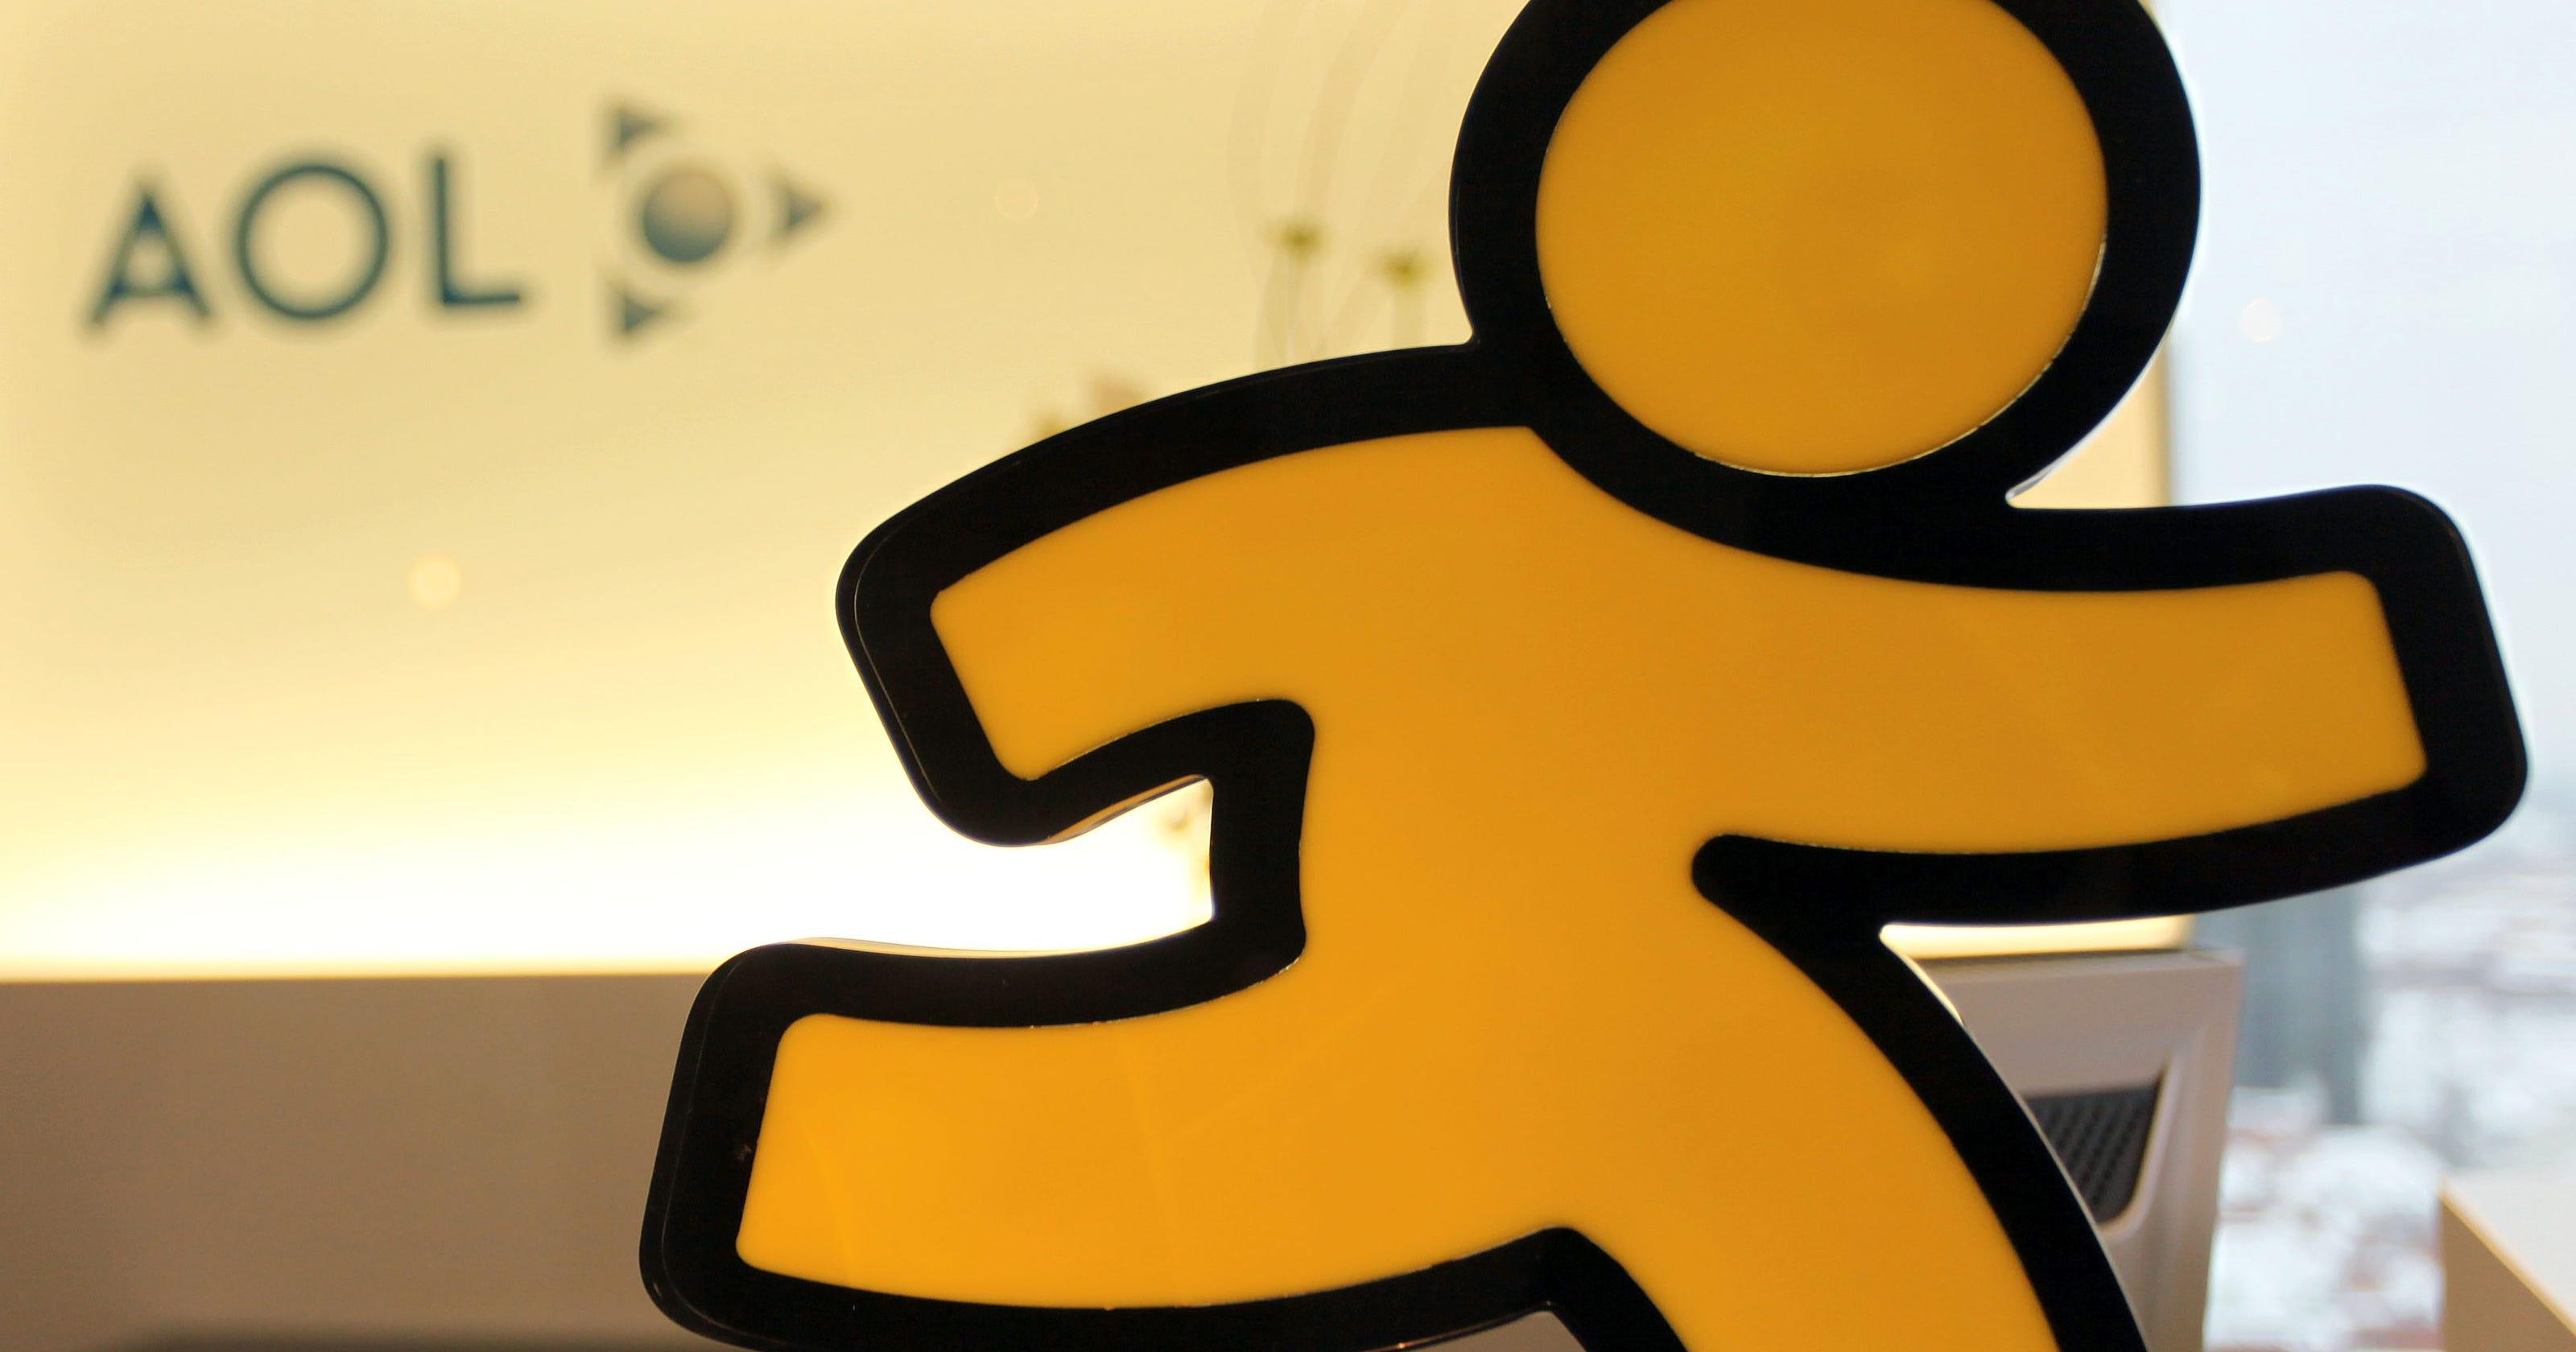 AOL's instant messenger is back: Meet AIM Phoenix